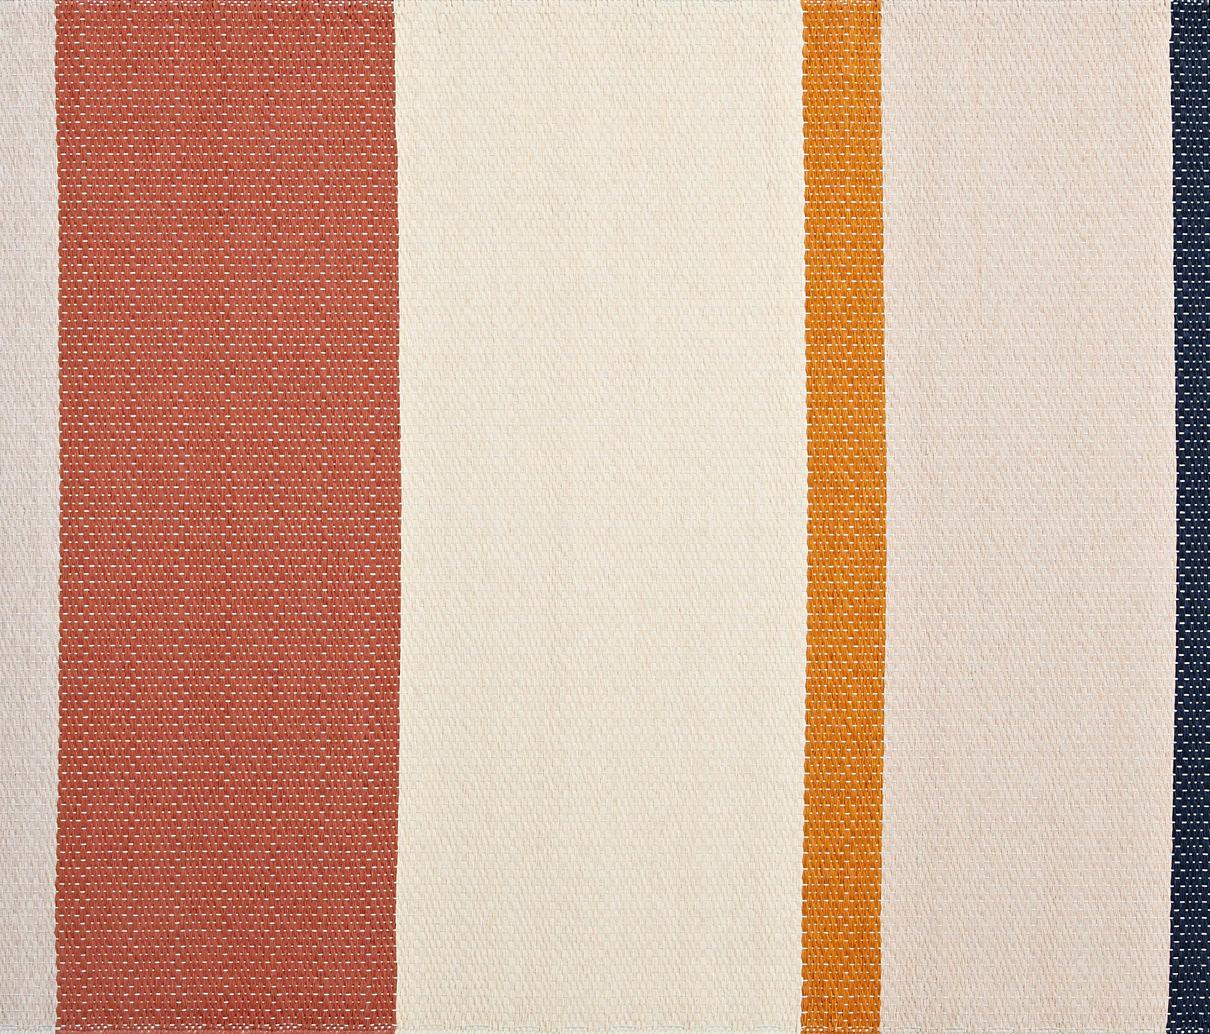 Paper Carpet Cinnamon Powder Tapis Tapis De Designers De Hay